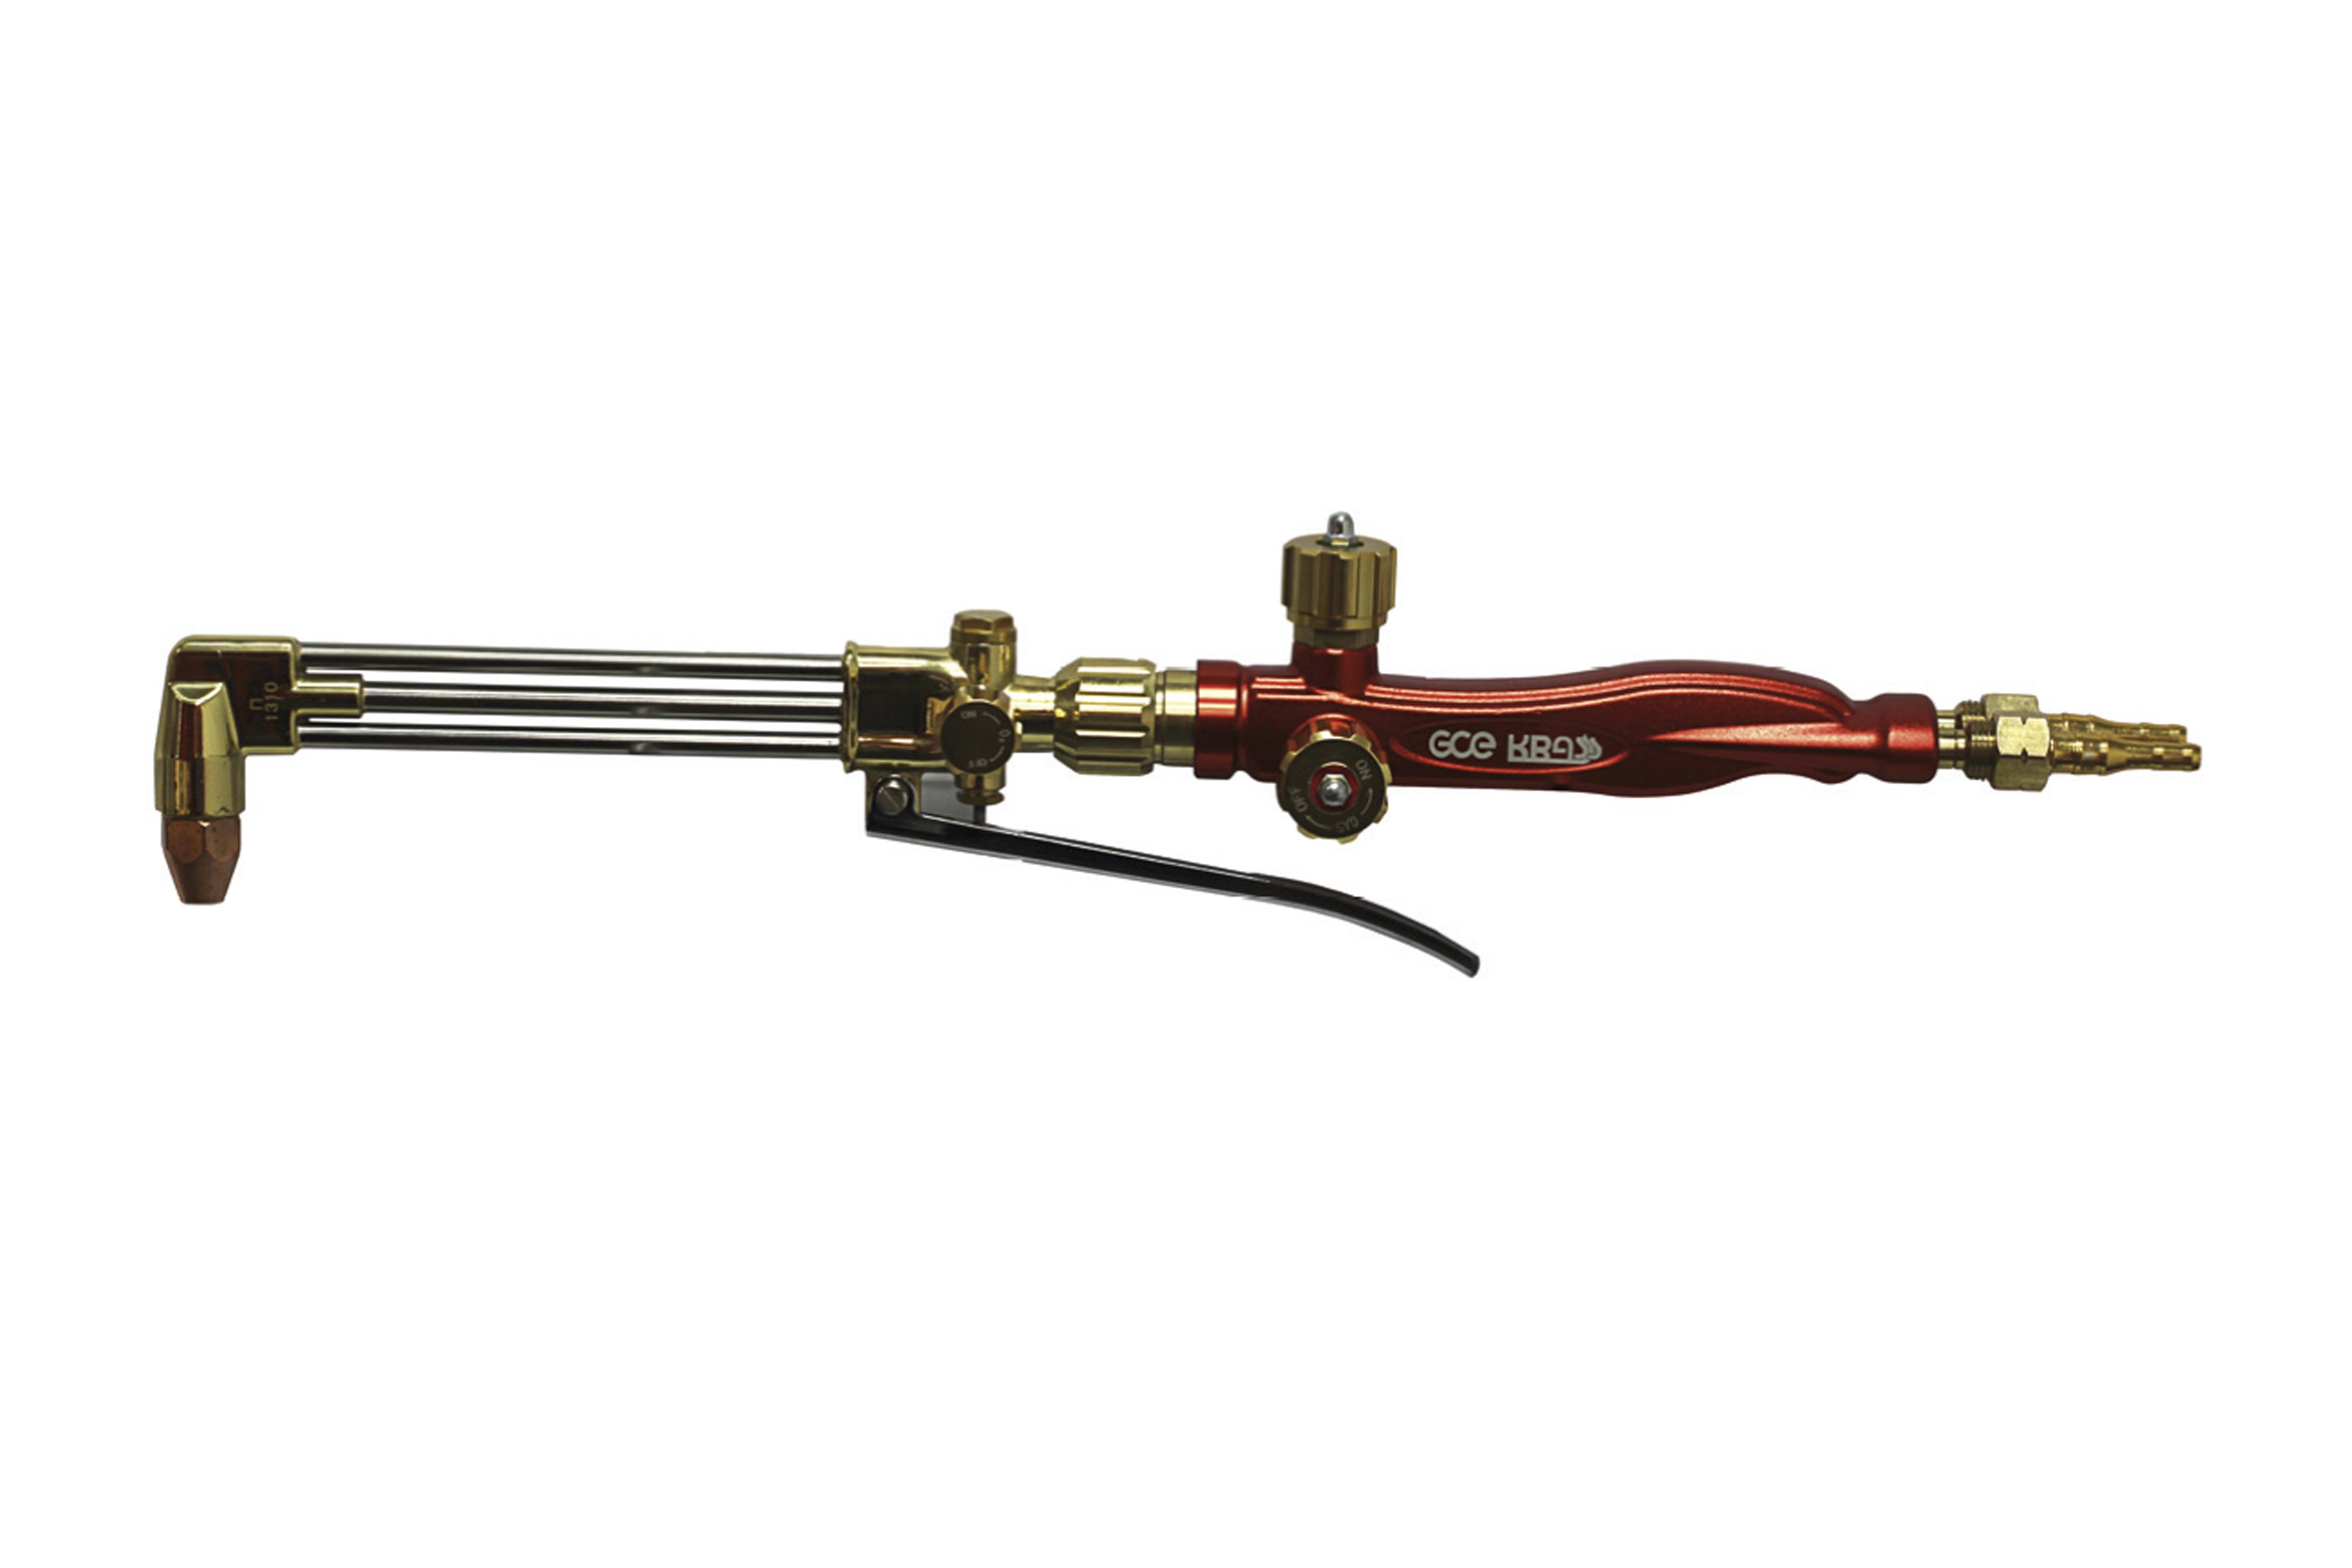 Резак пропановый Gce krass Rb-22Р fenix